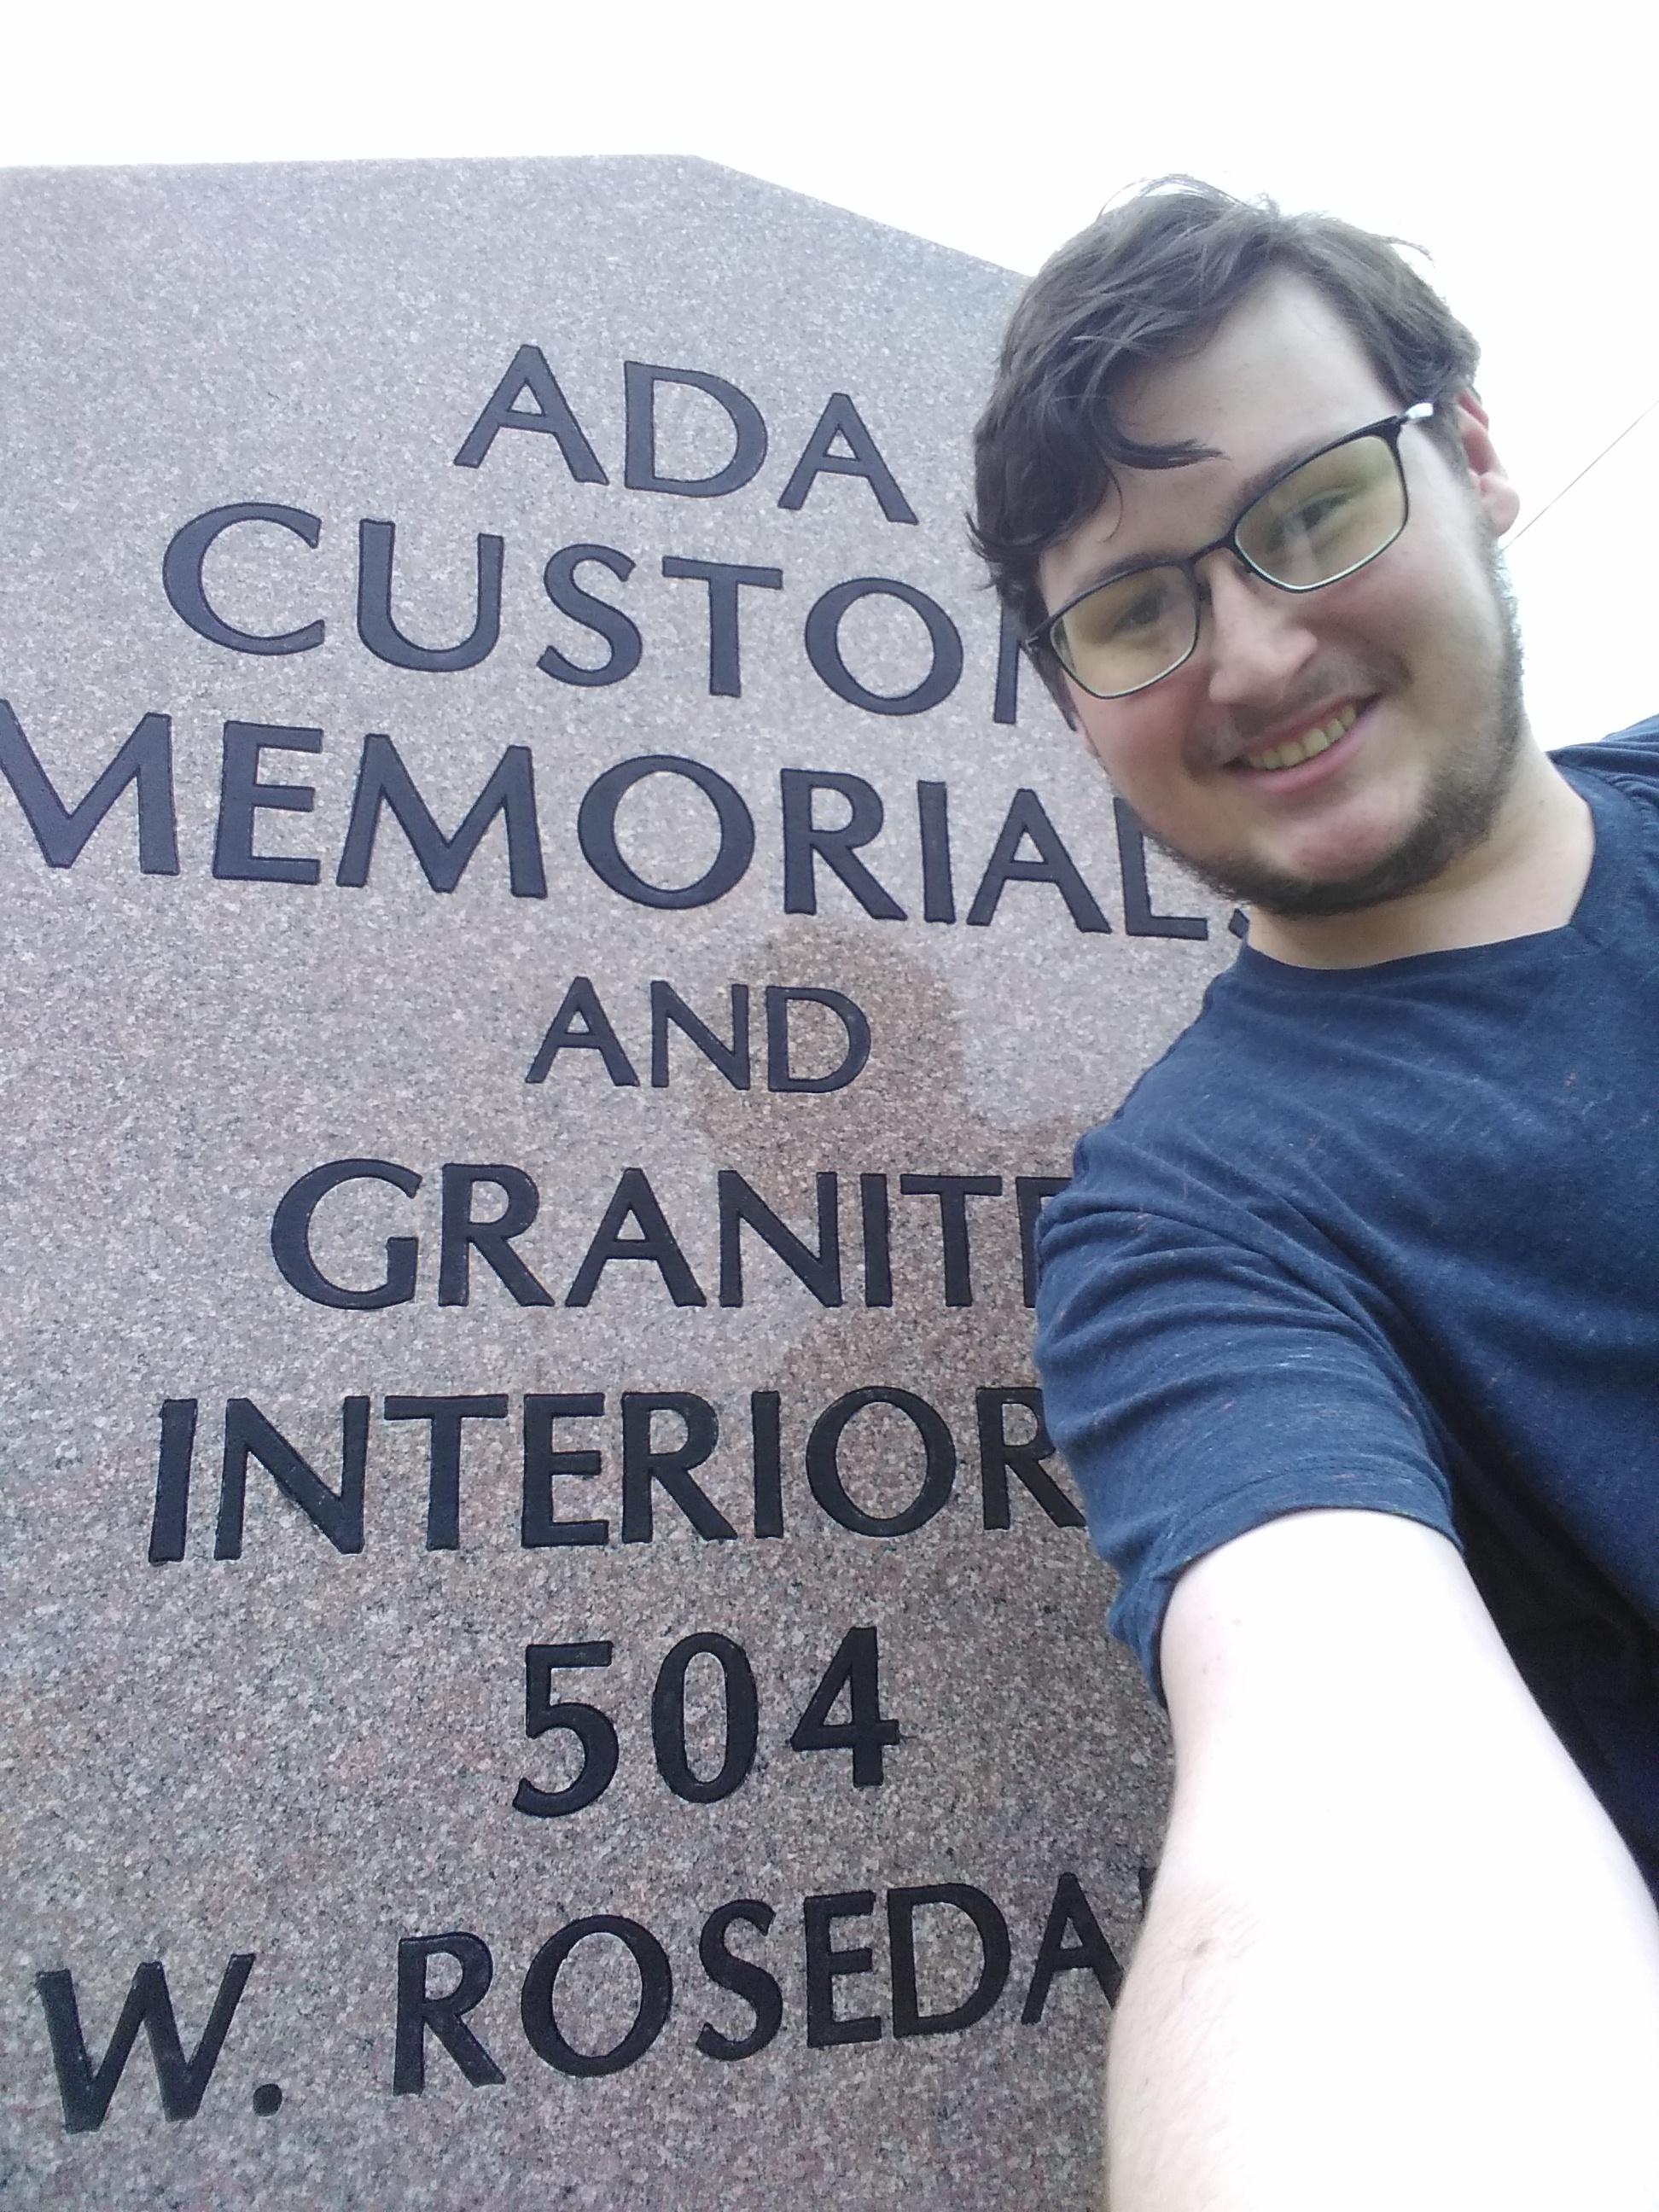 Photo of David Balliet next to Ada Custom Memorial sign